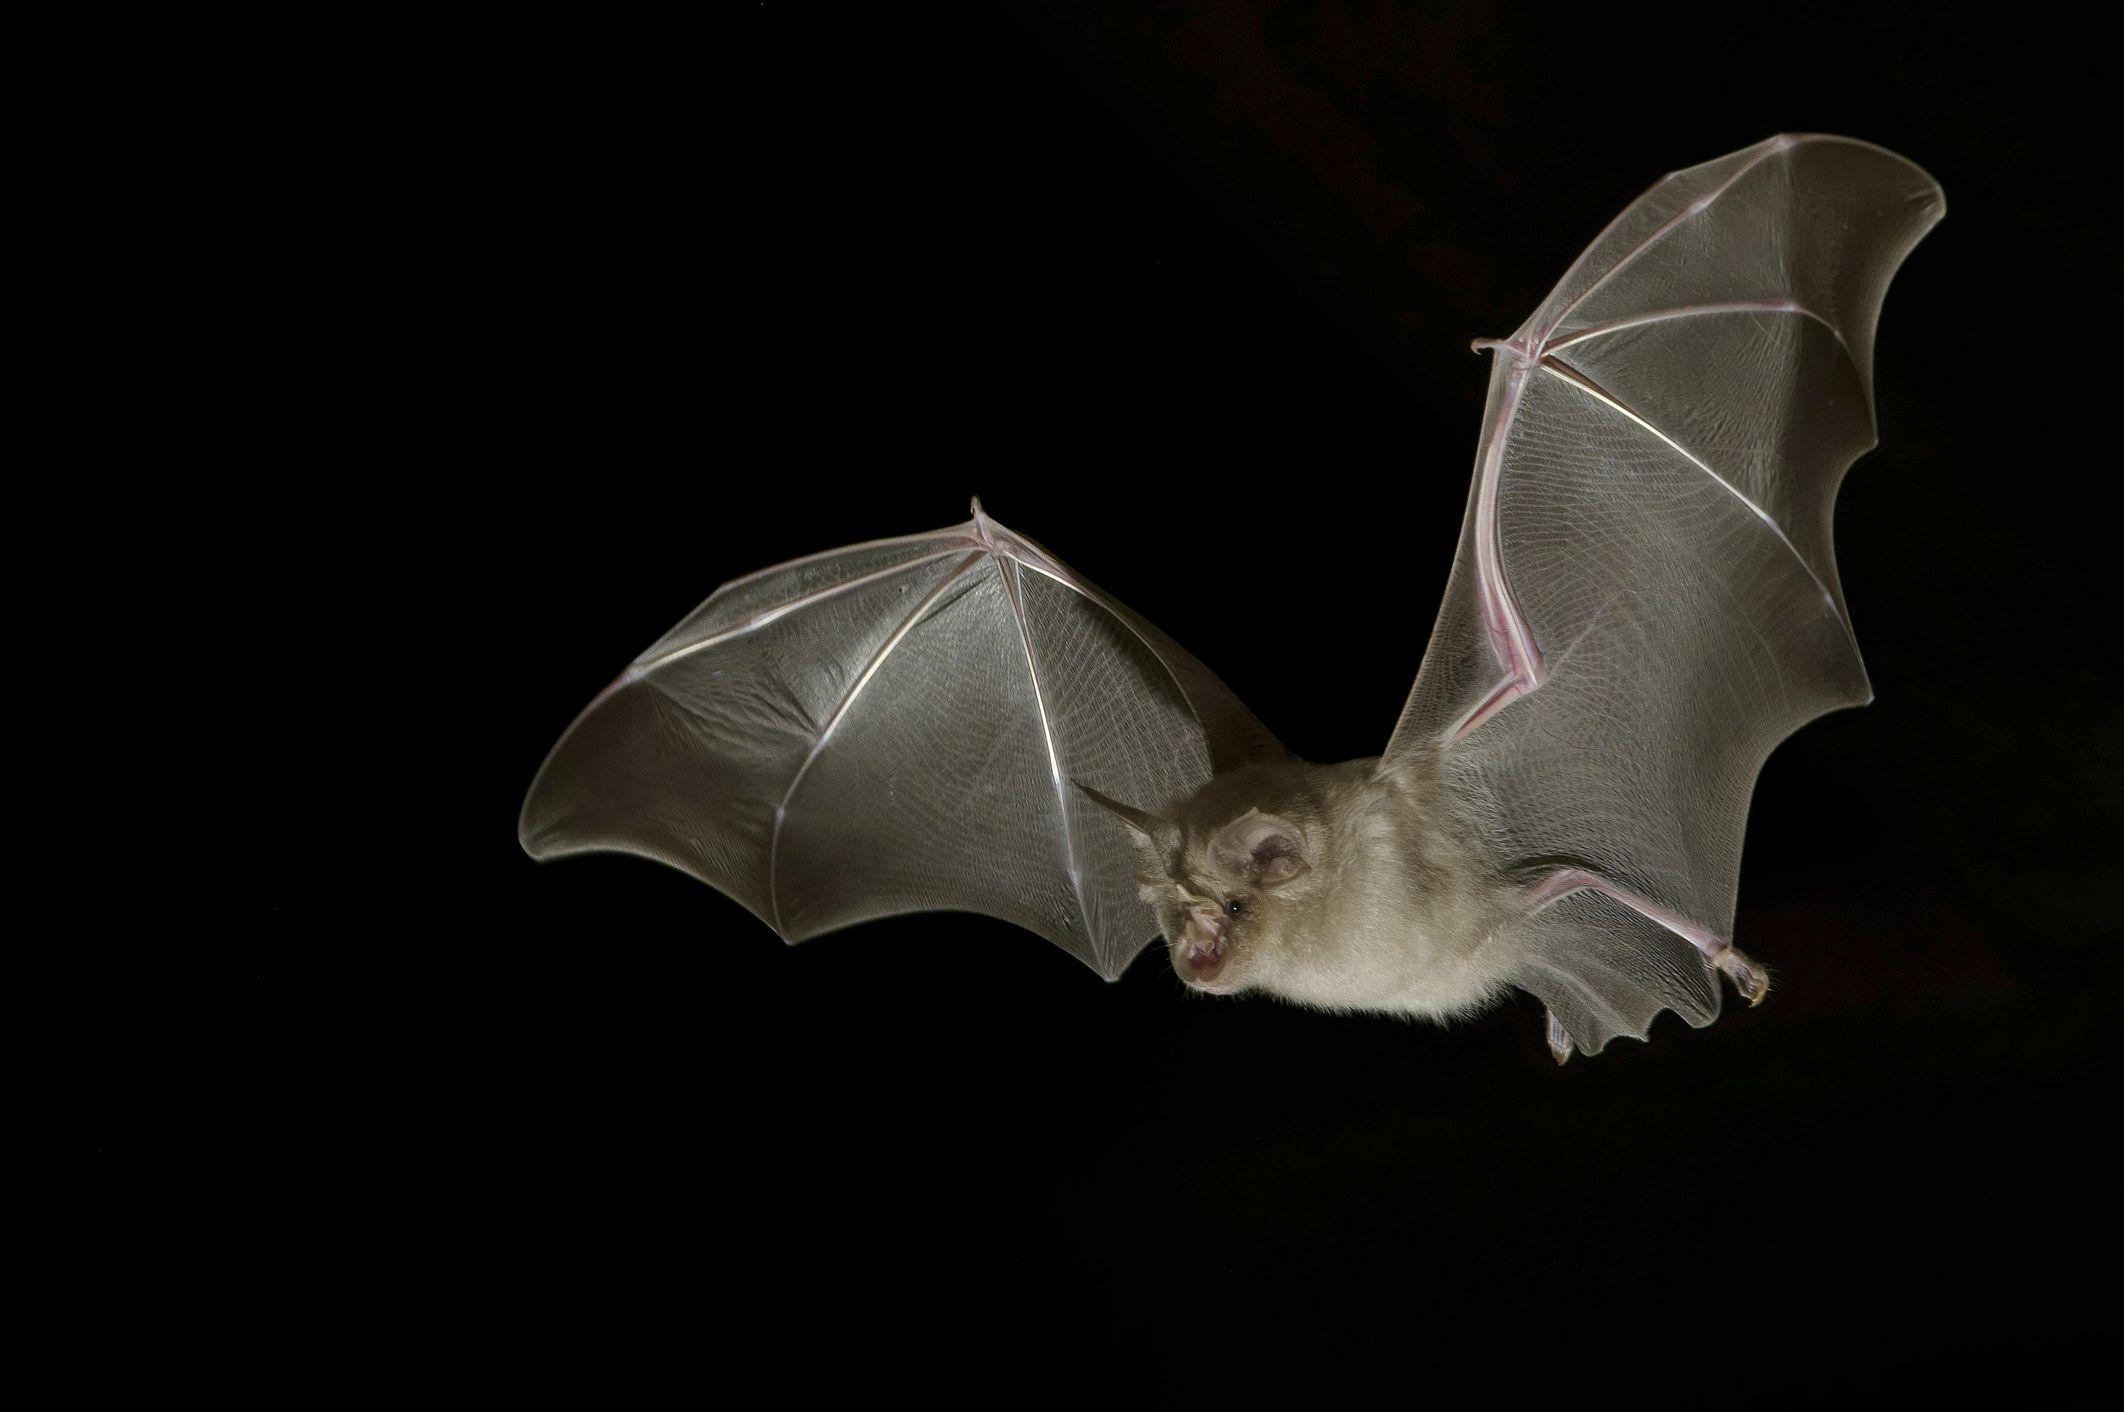 A greater horseshoe bat flies through the night sky